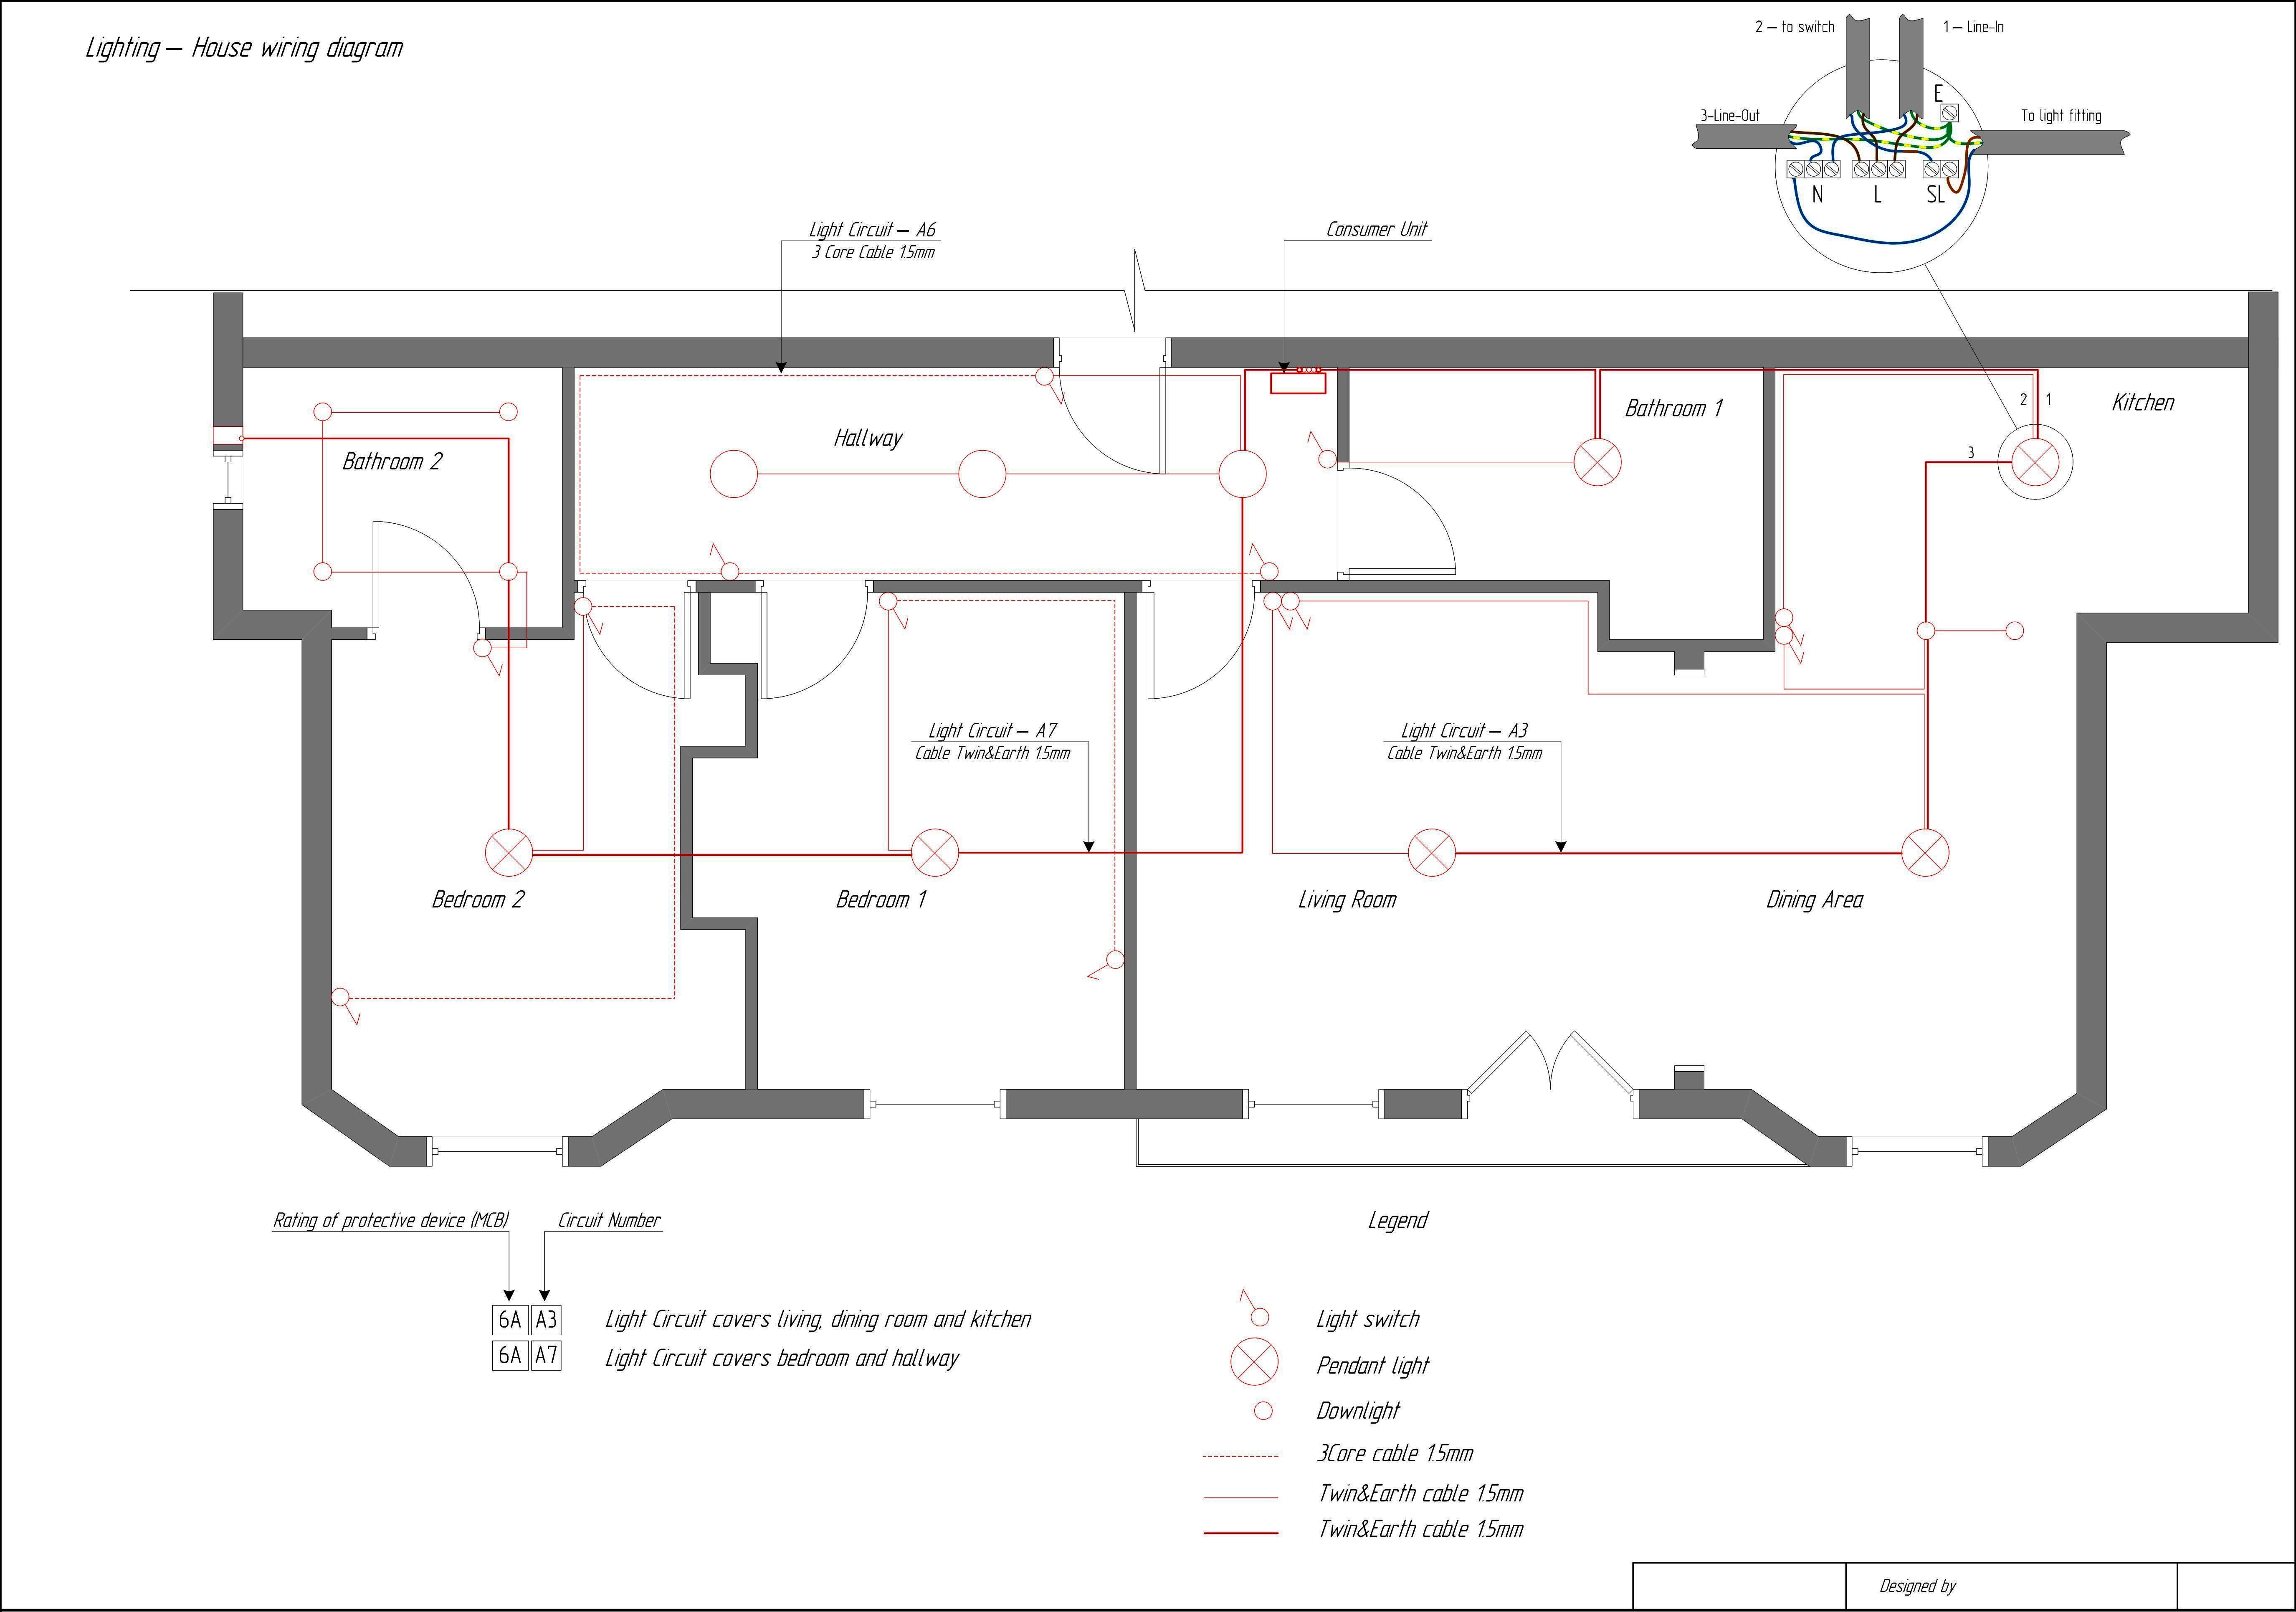 House Wiring Schematic - Wiring Diagram Data Oreo - Home Wiring Diagram